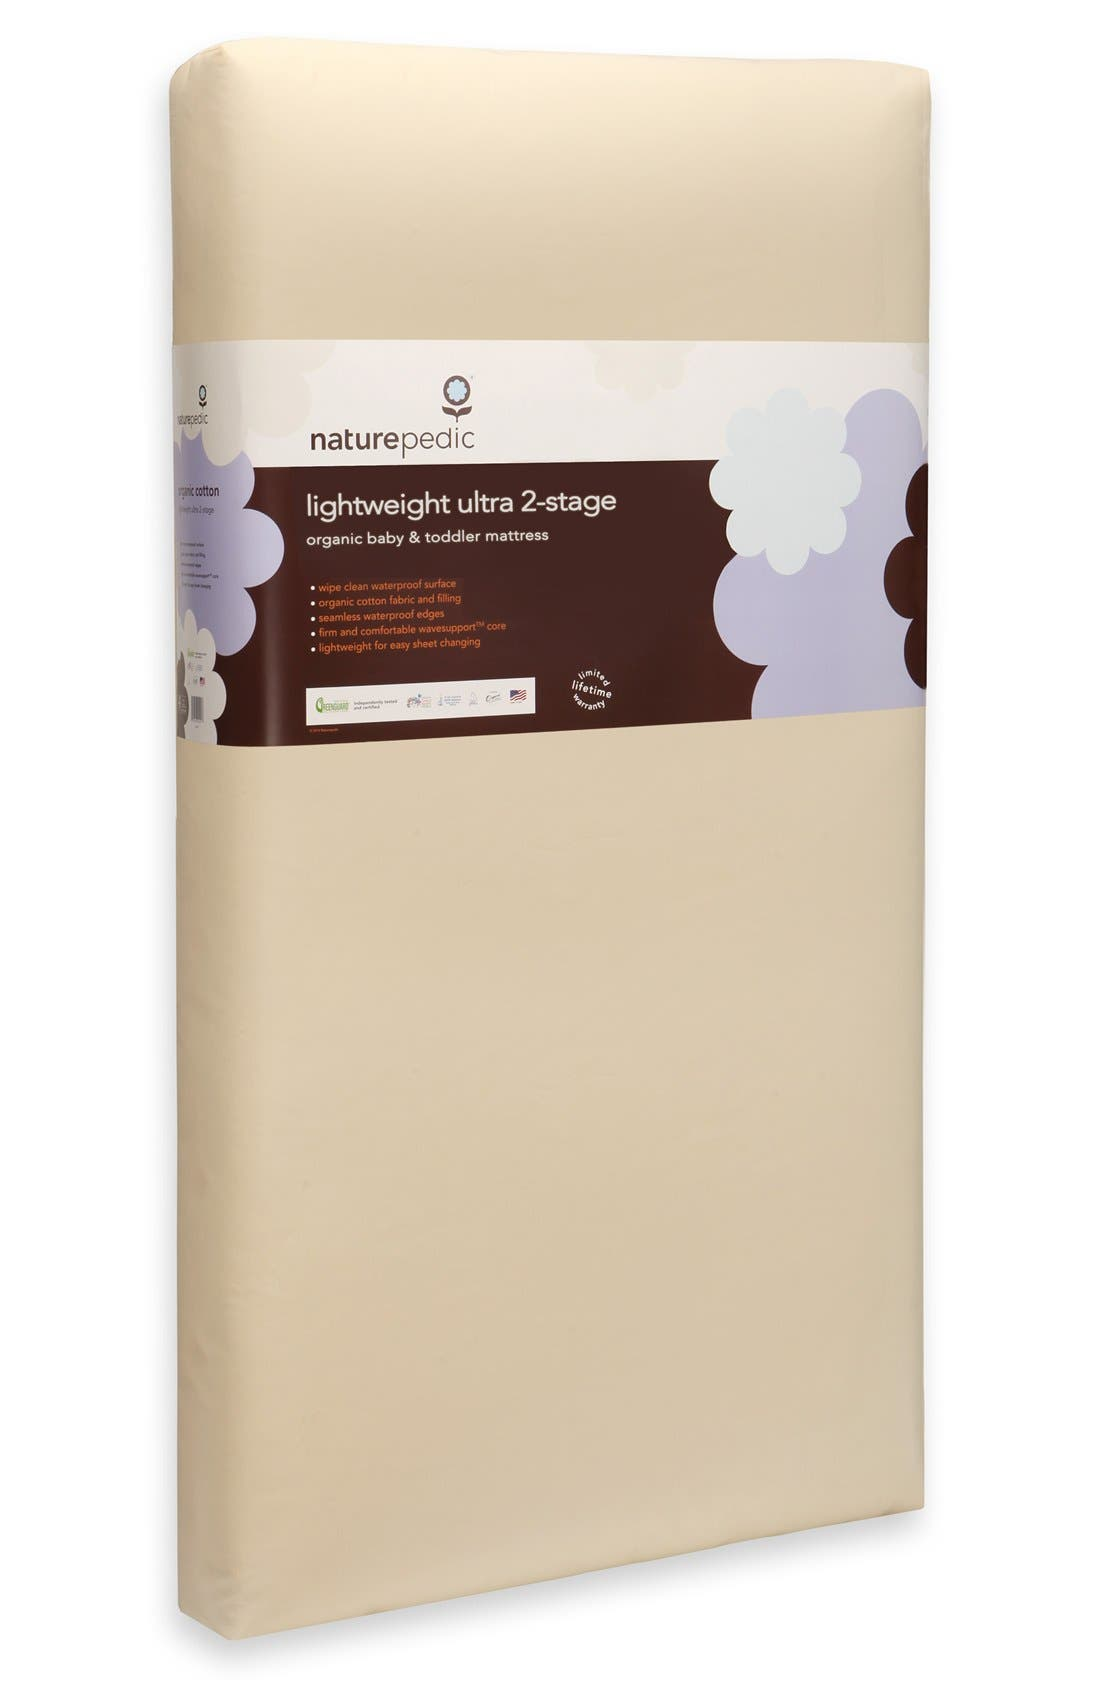 NATUREPEDIC, Lightweight Organic Cotton Ultra 2-Stage Crib Mattress, Alternate thumbnail 2, color, NATURAL